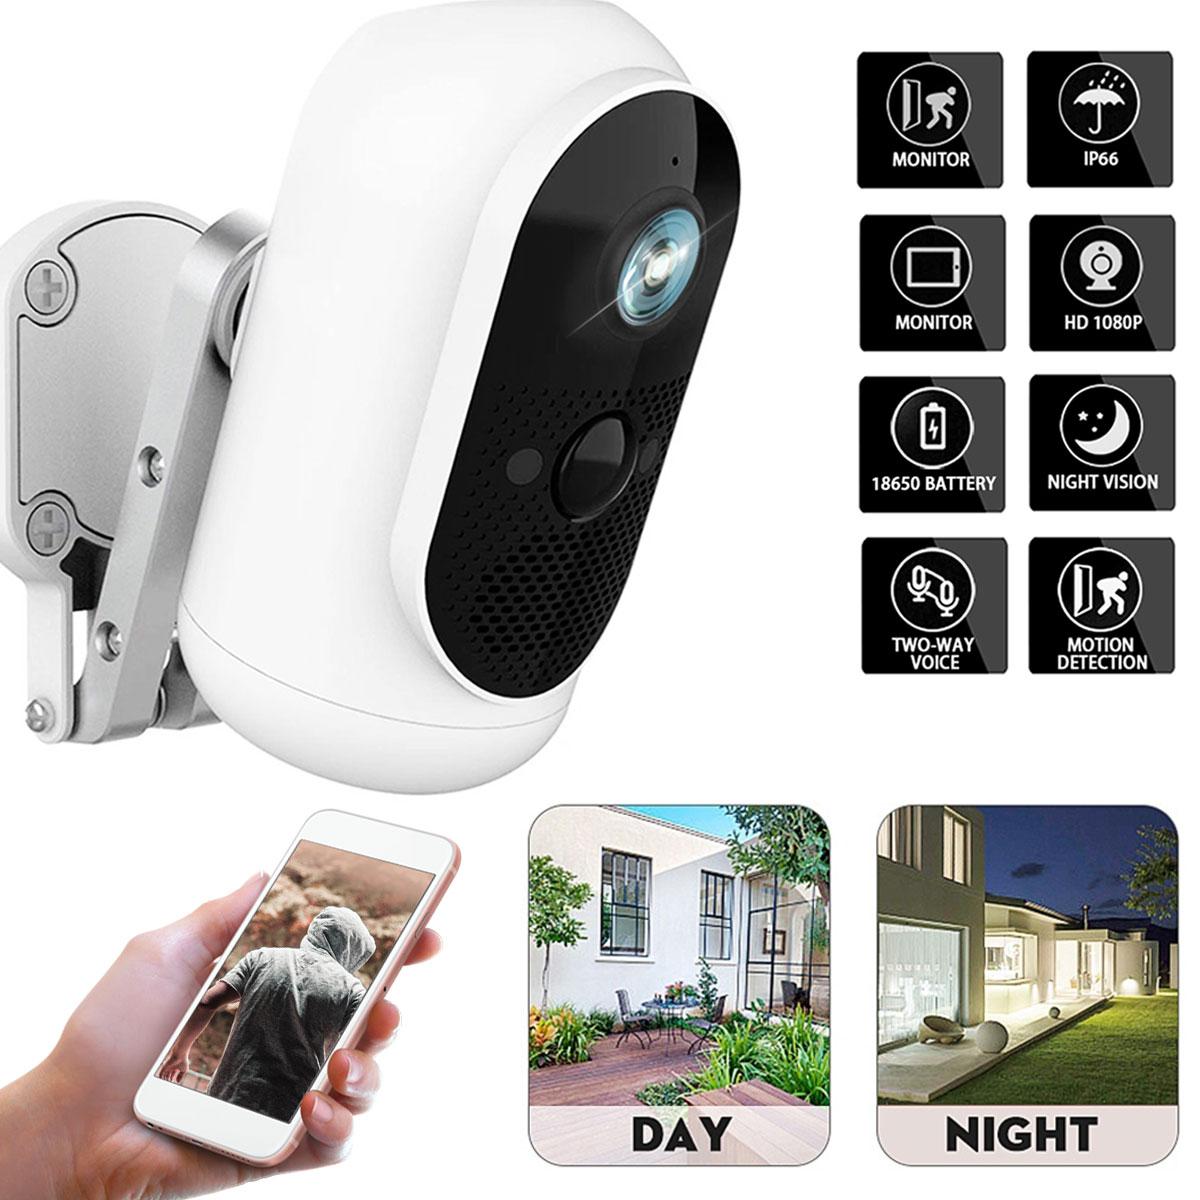 100% Wire-free Home Security 1080P HD Mini IP Camera WiFi Wireless Night Vision Camera 6000mA Battery PIR Camera IP